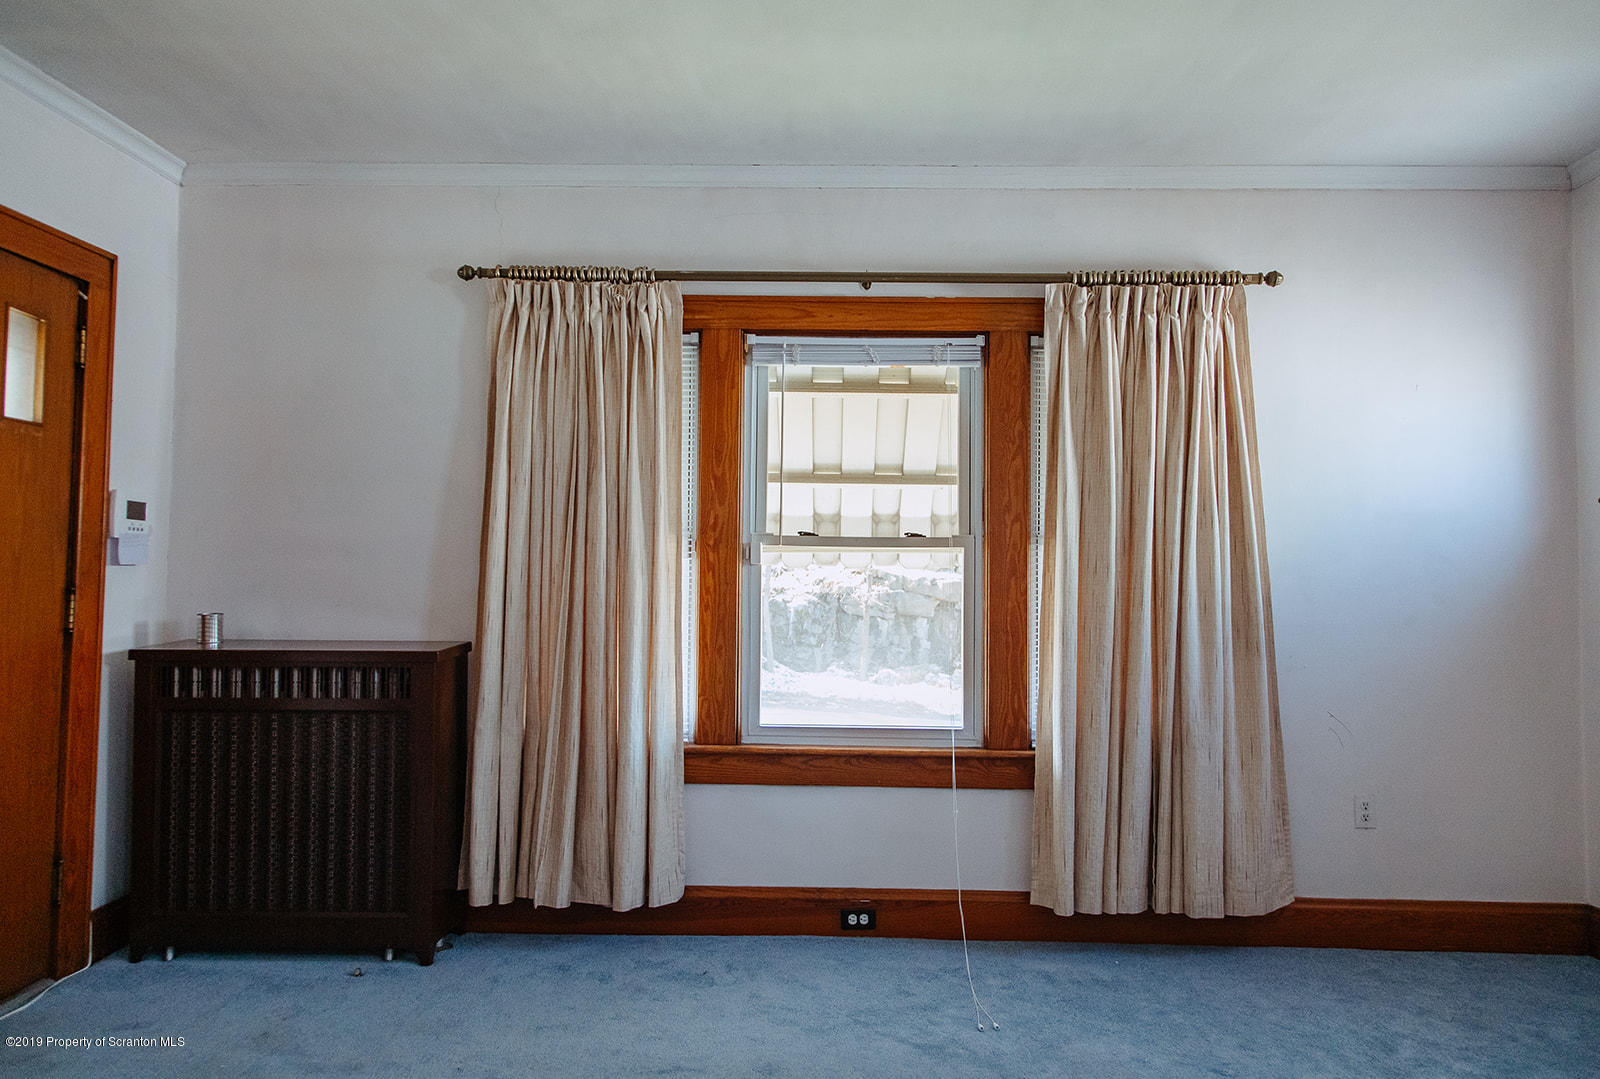 943 Moosic St, Scranton, Pennsylvania 18505, 3 Bedrooms Bedrooms, 6 Rooms Rooms,1 BathroomBathrooms,Single Family,For Sale,Moosic,19-1202